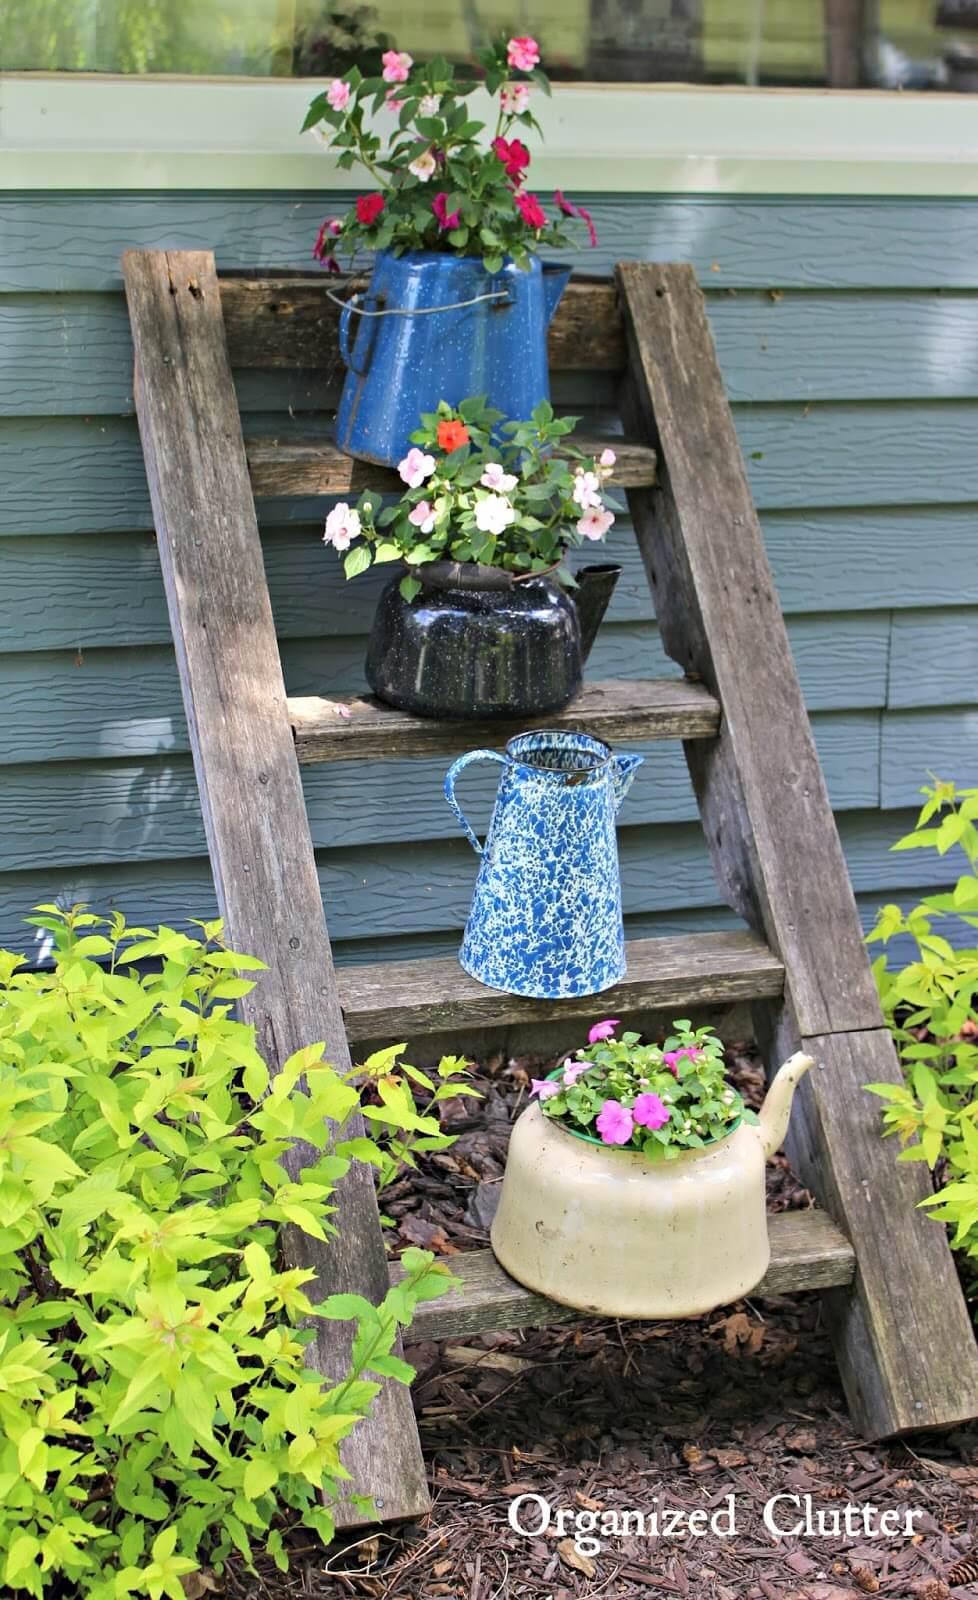 34 Best Vintage Garden Decor Ideas and Designs for 2017 on Garden Decor Ideas  id=20462